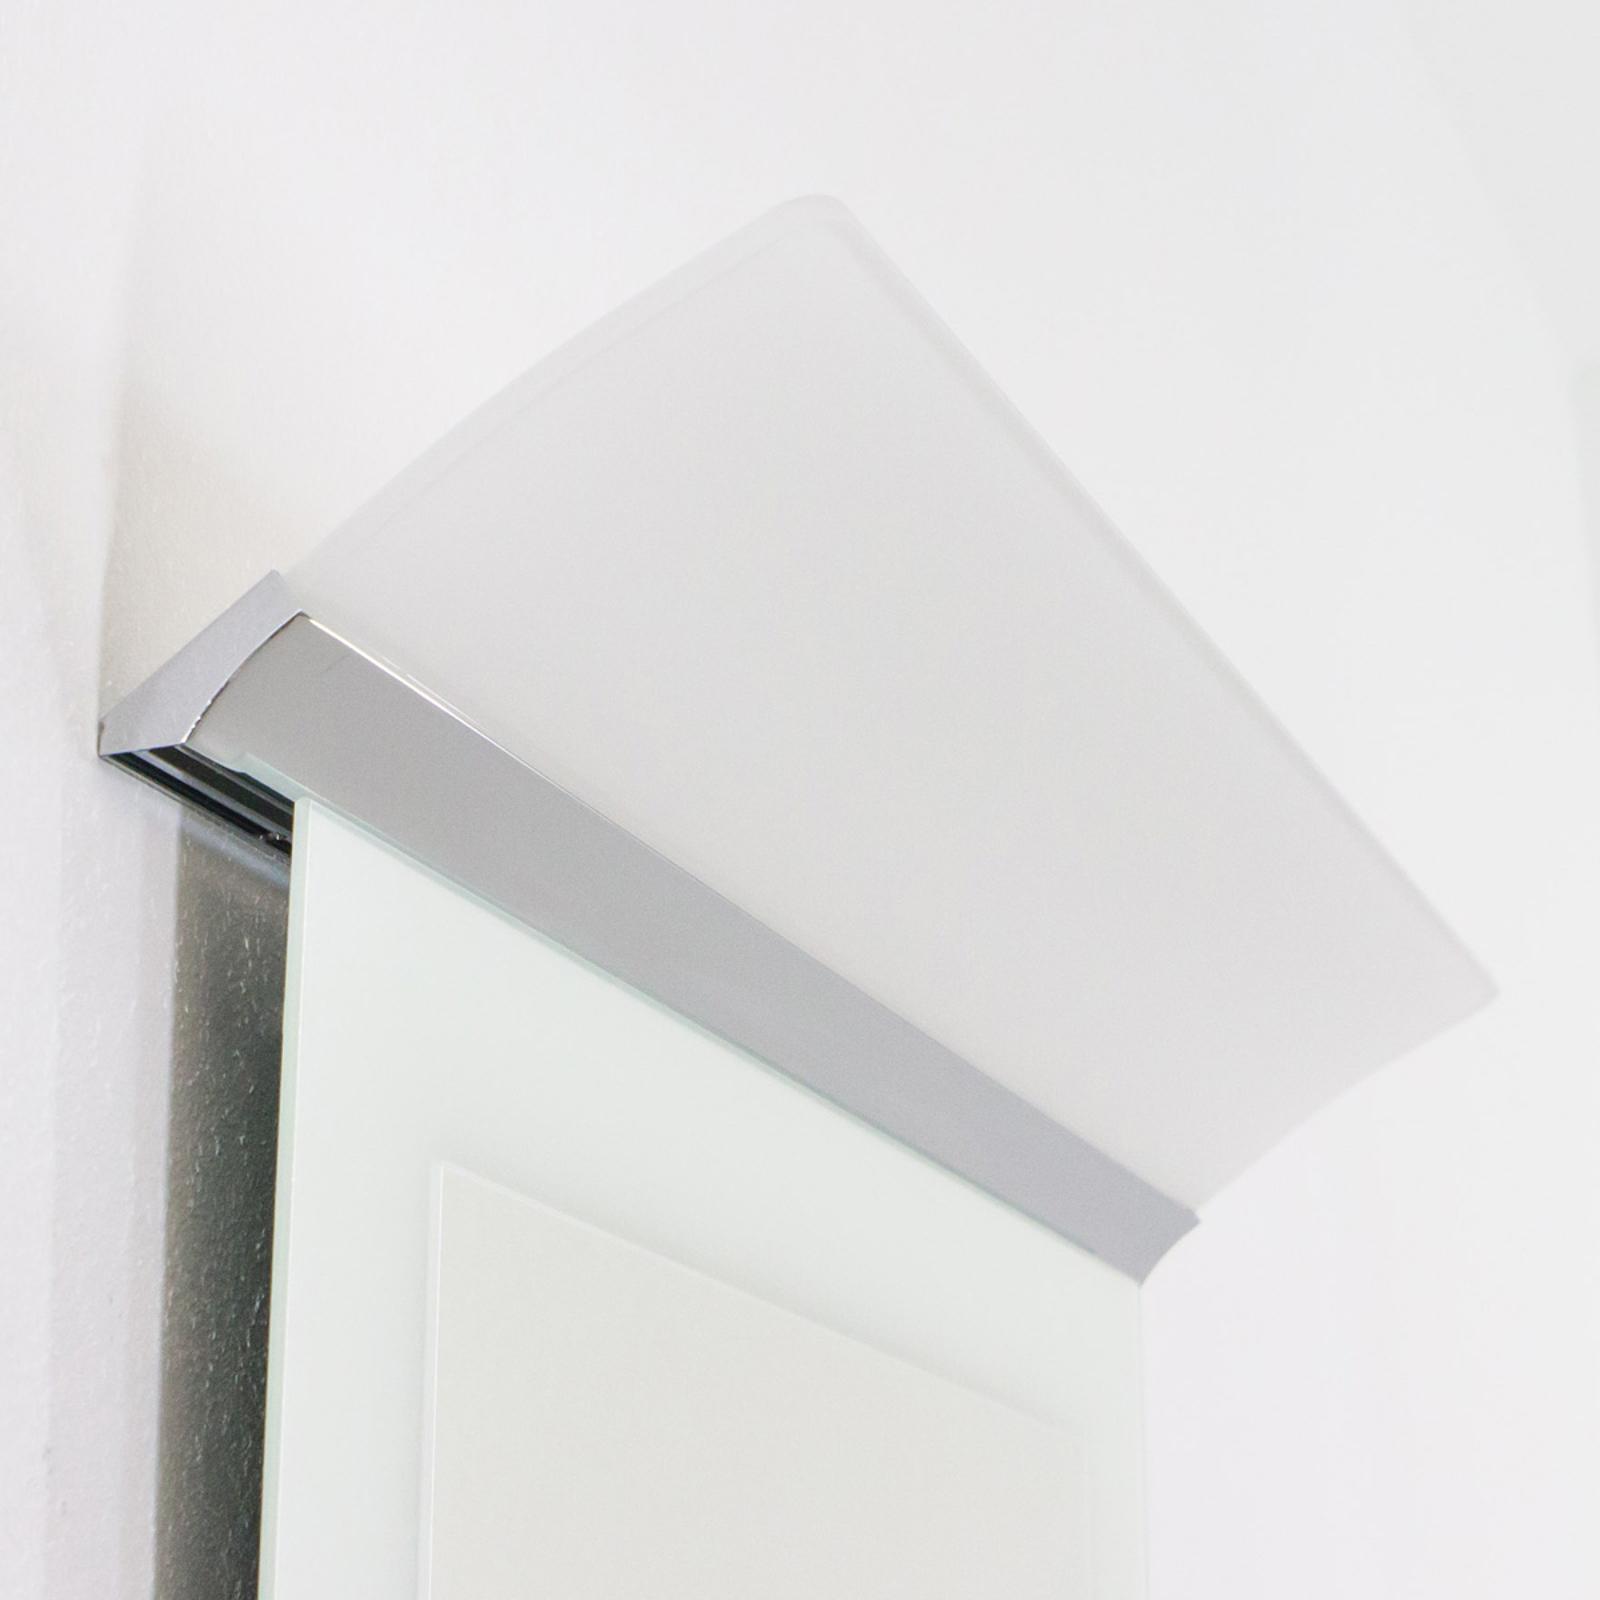 Flat LED-speillampe Angela, IP44, 50 cm